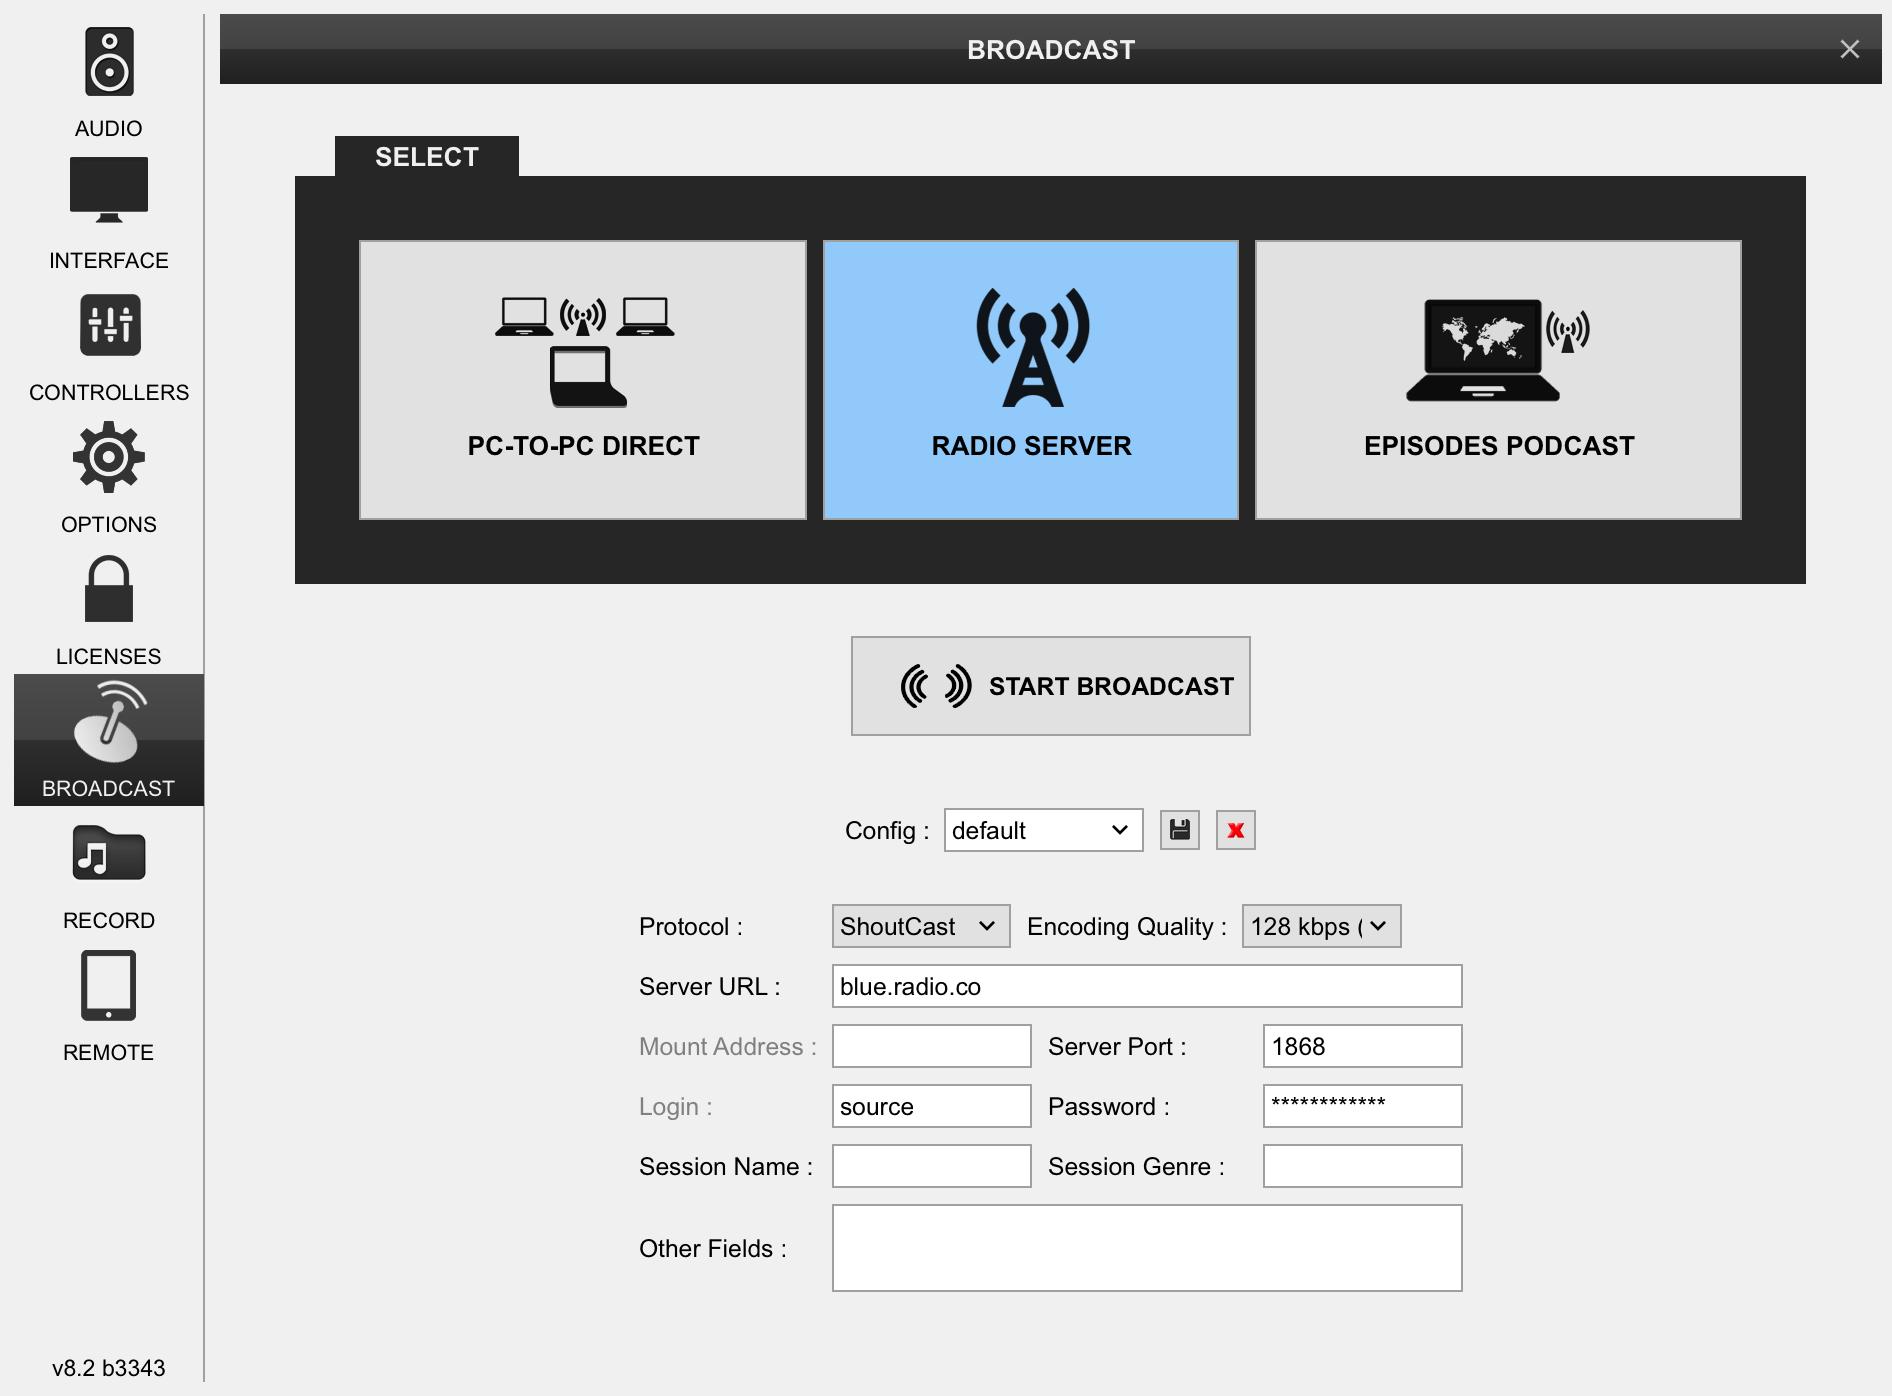 Virtual DJ Pro 8 radio server settings.